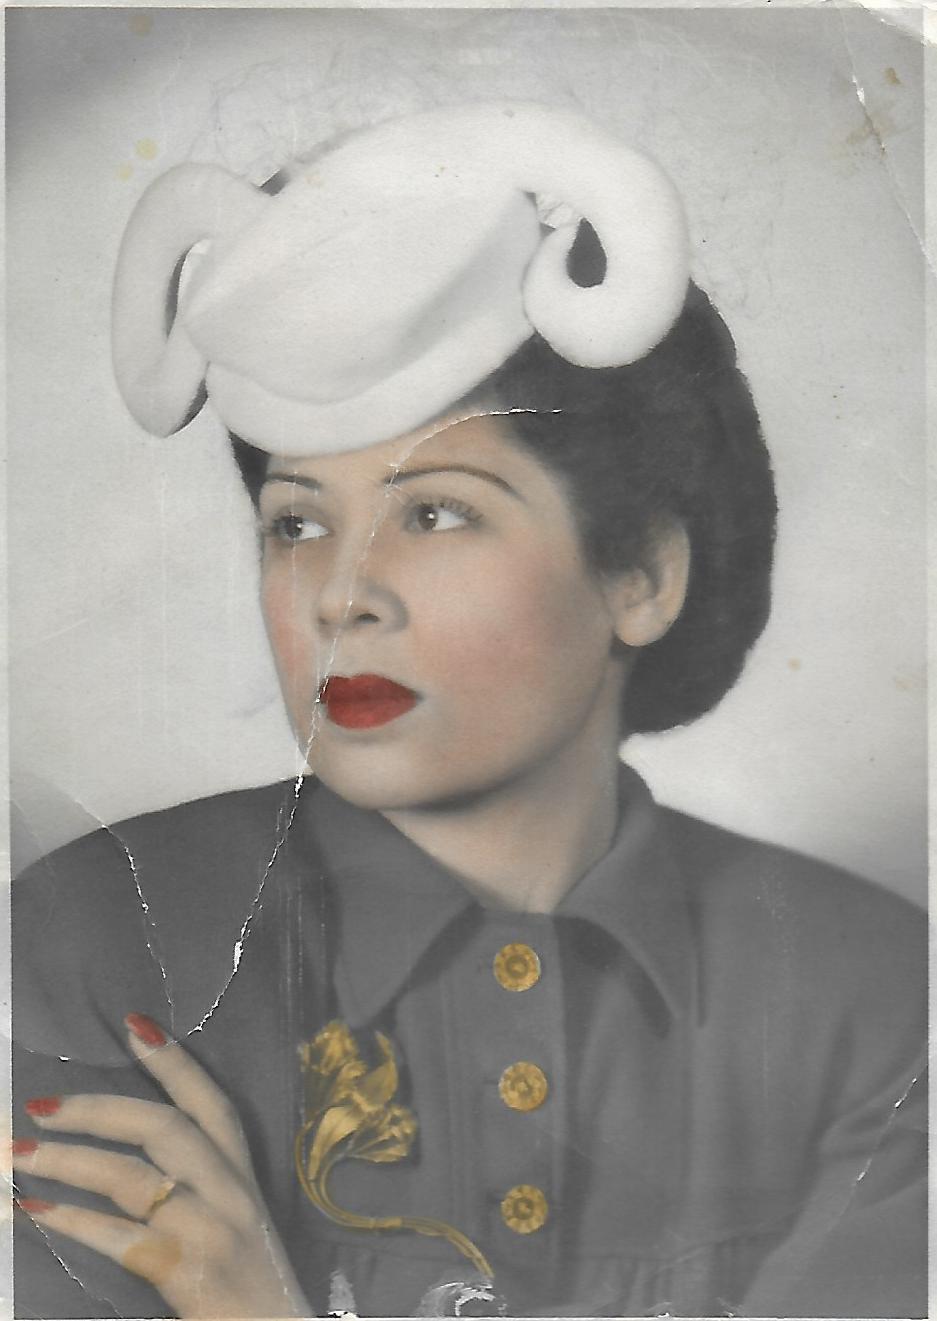 Maria R. Balidio